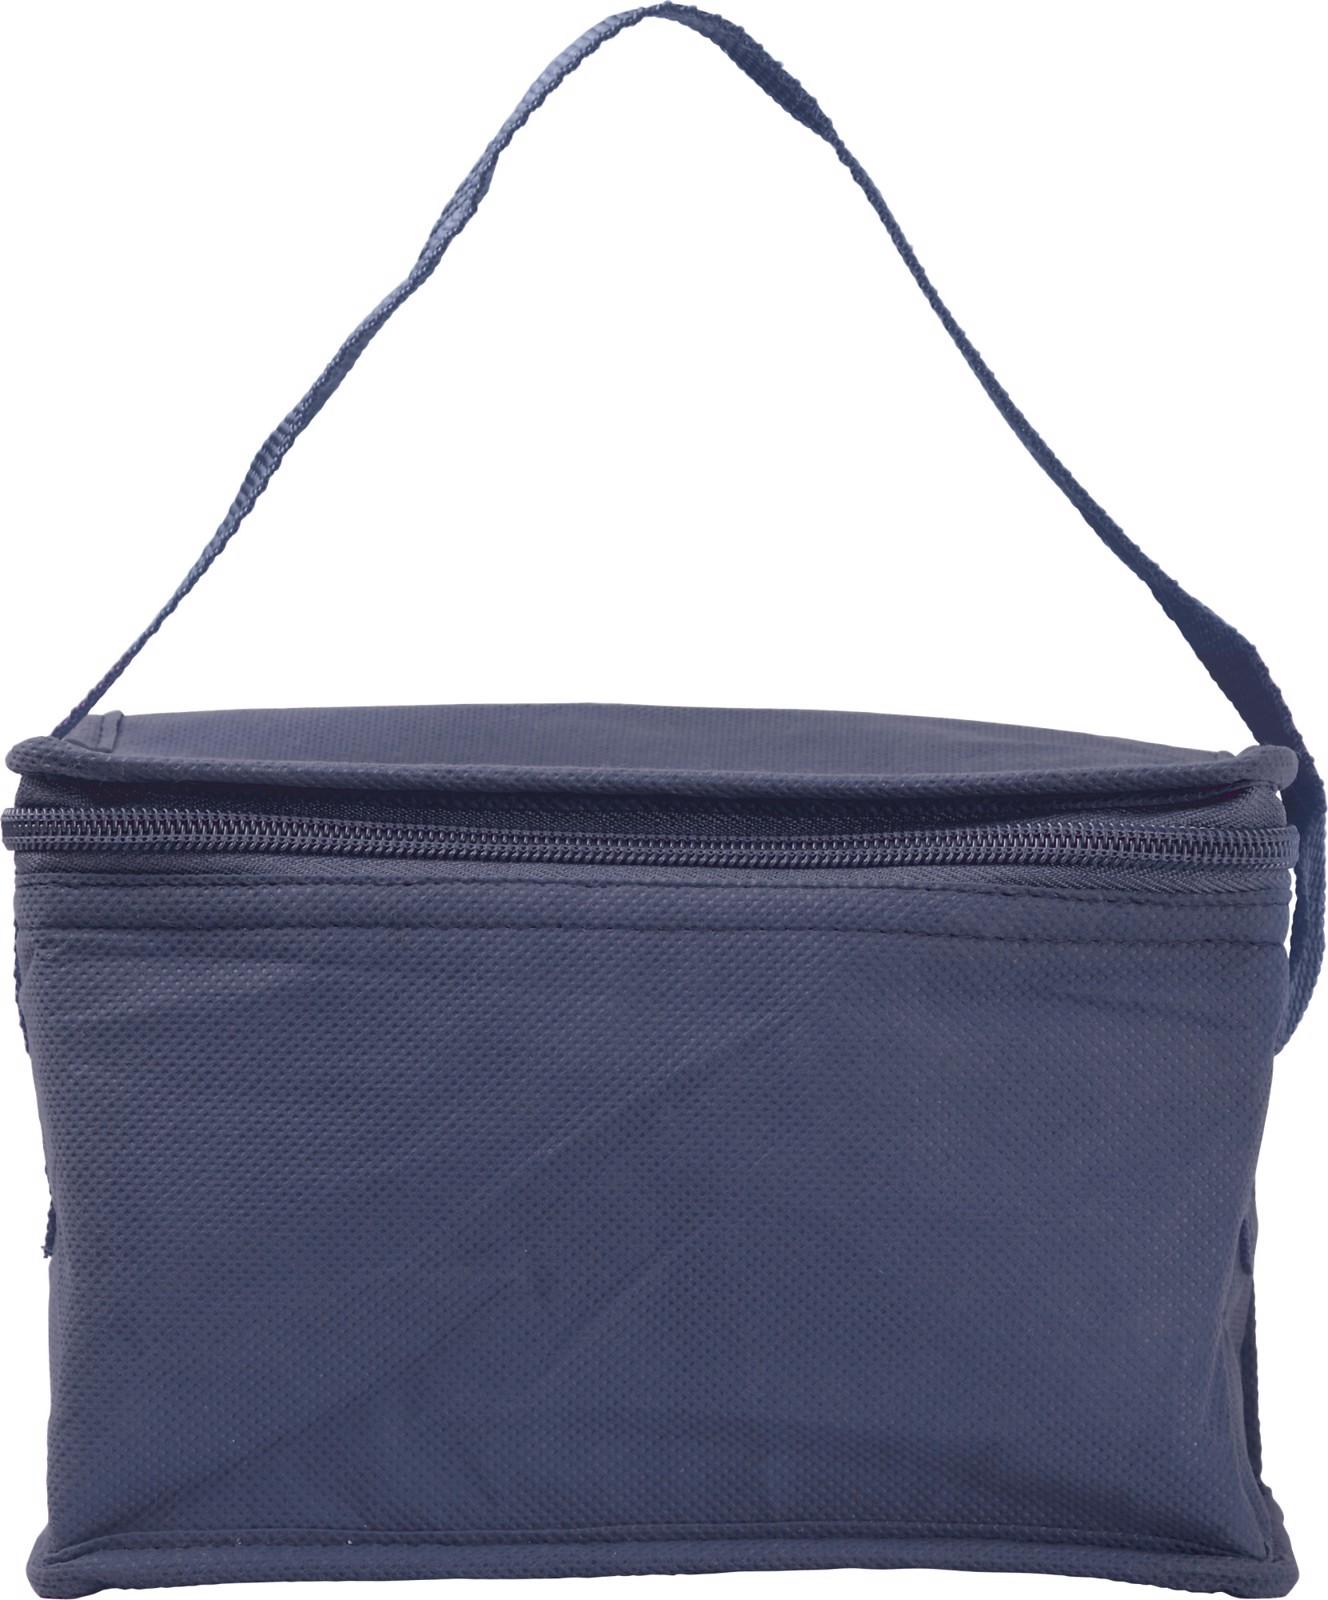 Nonwoven (80 gr/m²) cooler bag - Blue